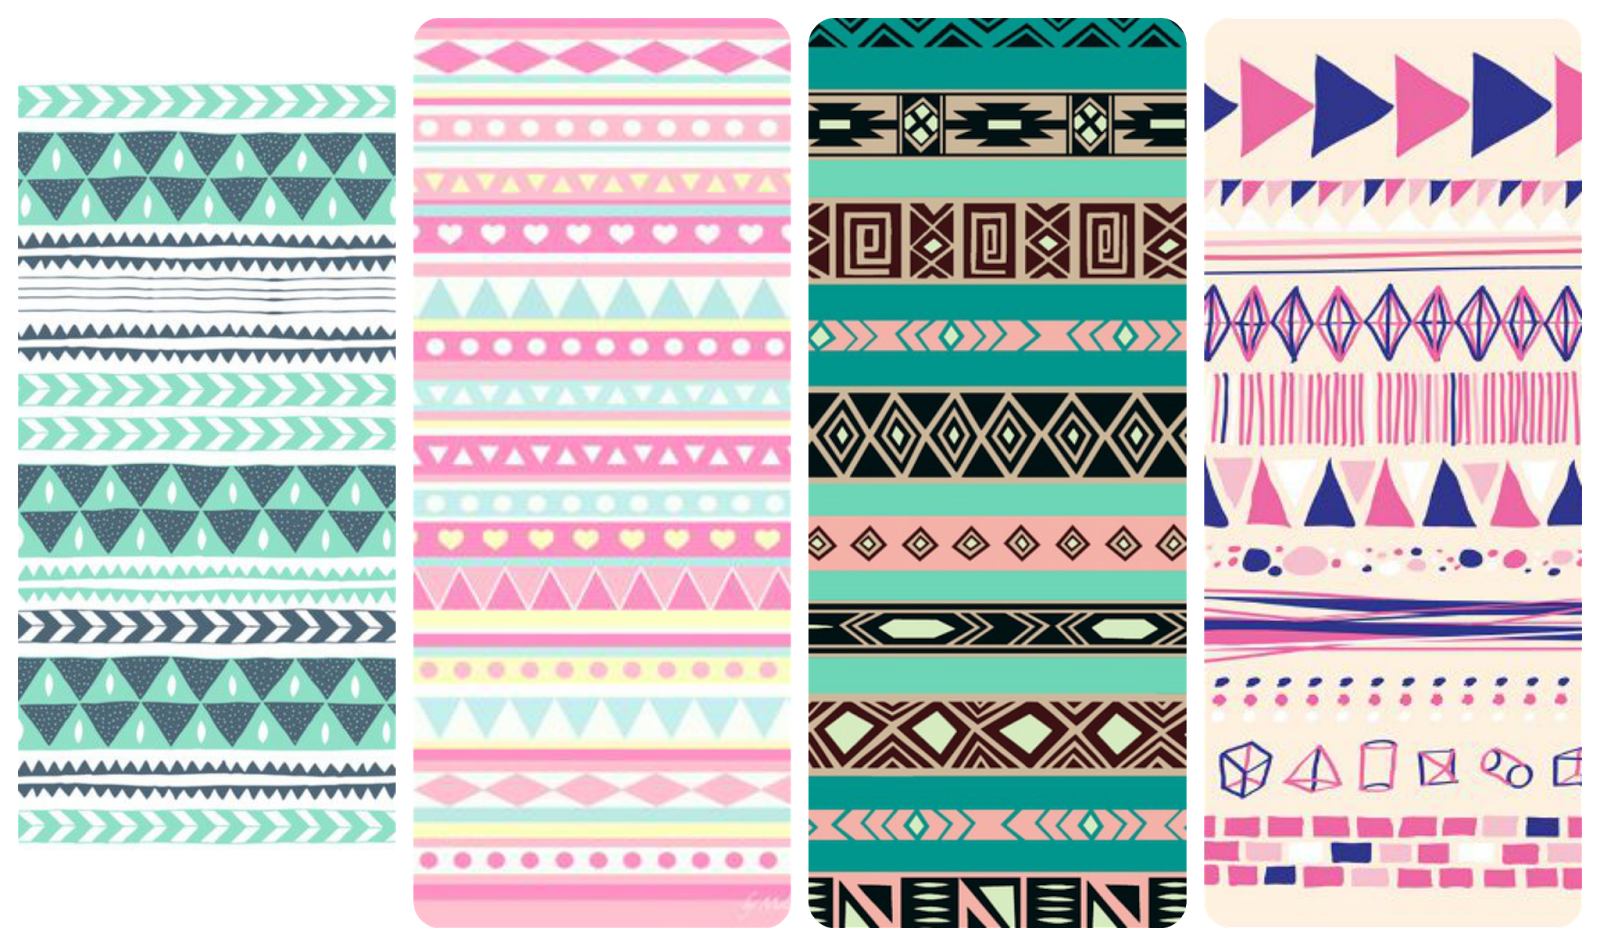 fondos chulos de pantalla para el móvil Iphone, android, samsung Aztec pattern